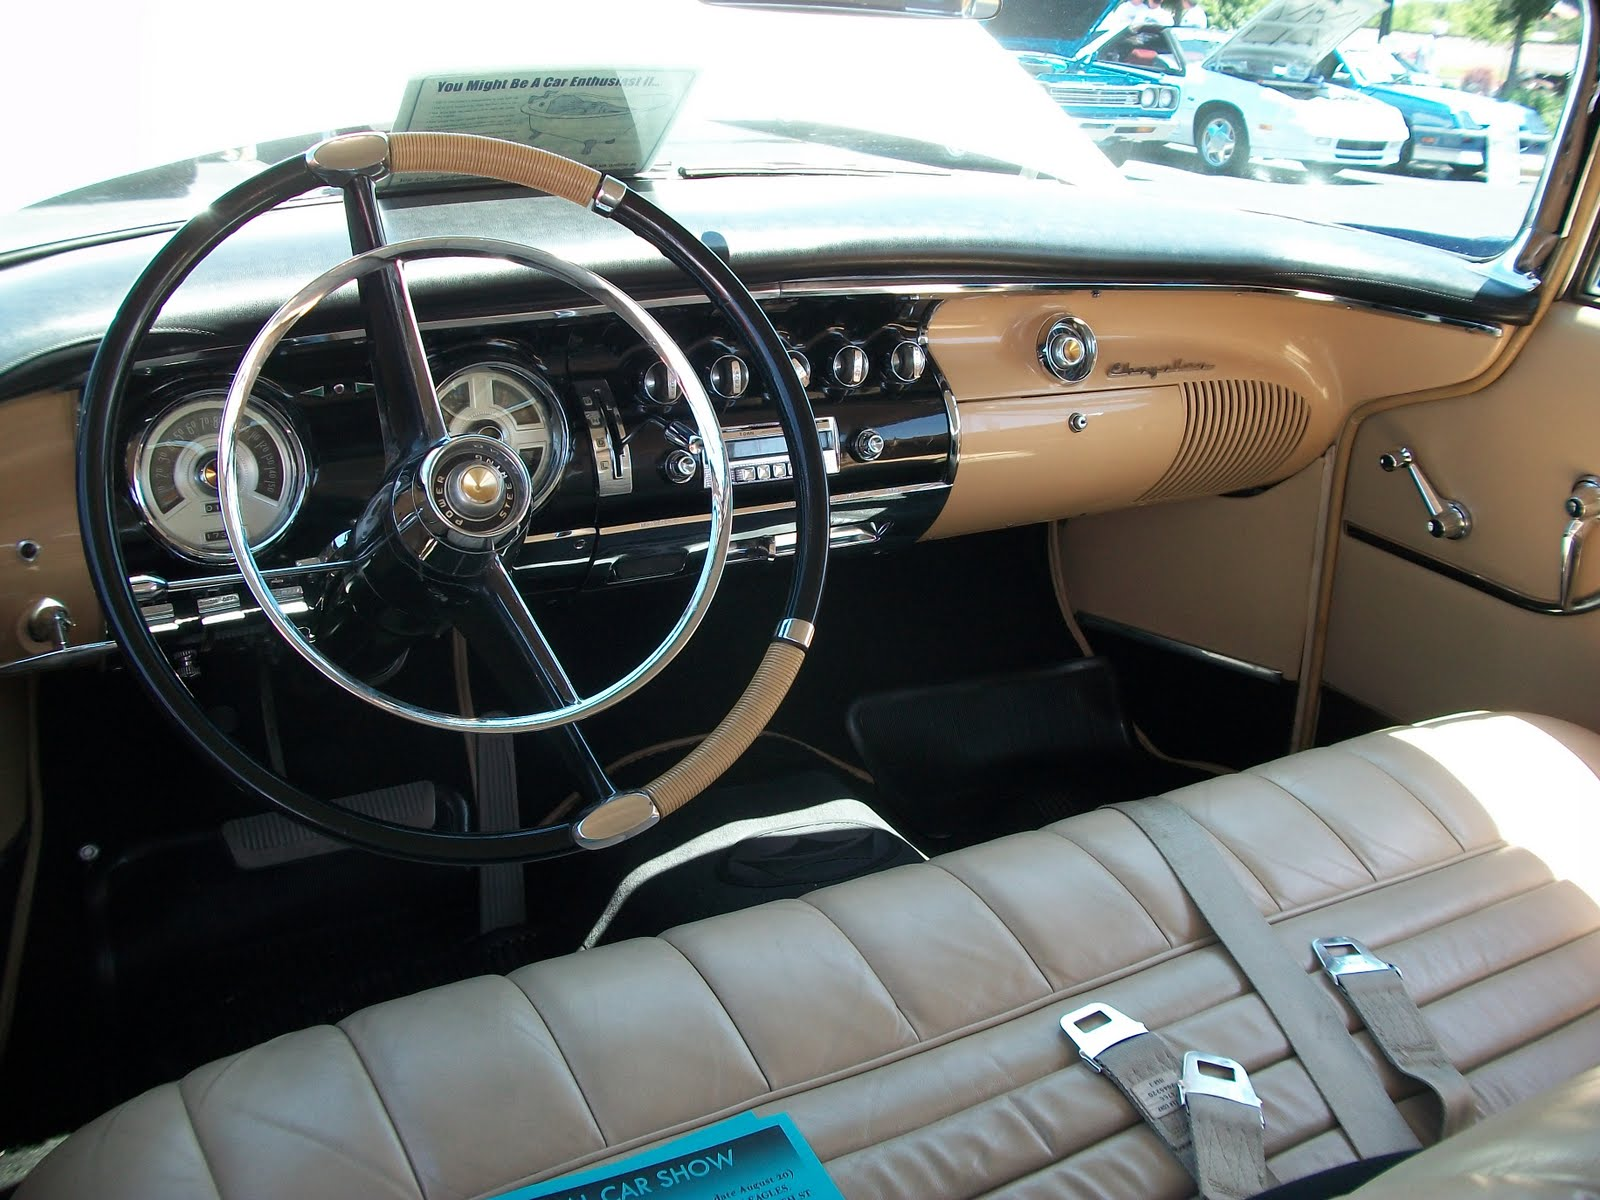 1955 dodge custom royal lancer 4 door sedan 15699 - 1955 Chrysler Interior Related Keywords Suggestions 1600x1200 Viewing A Thread 1955 Dodge Custom Royal 600x450